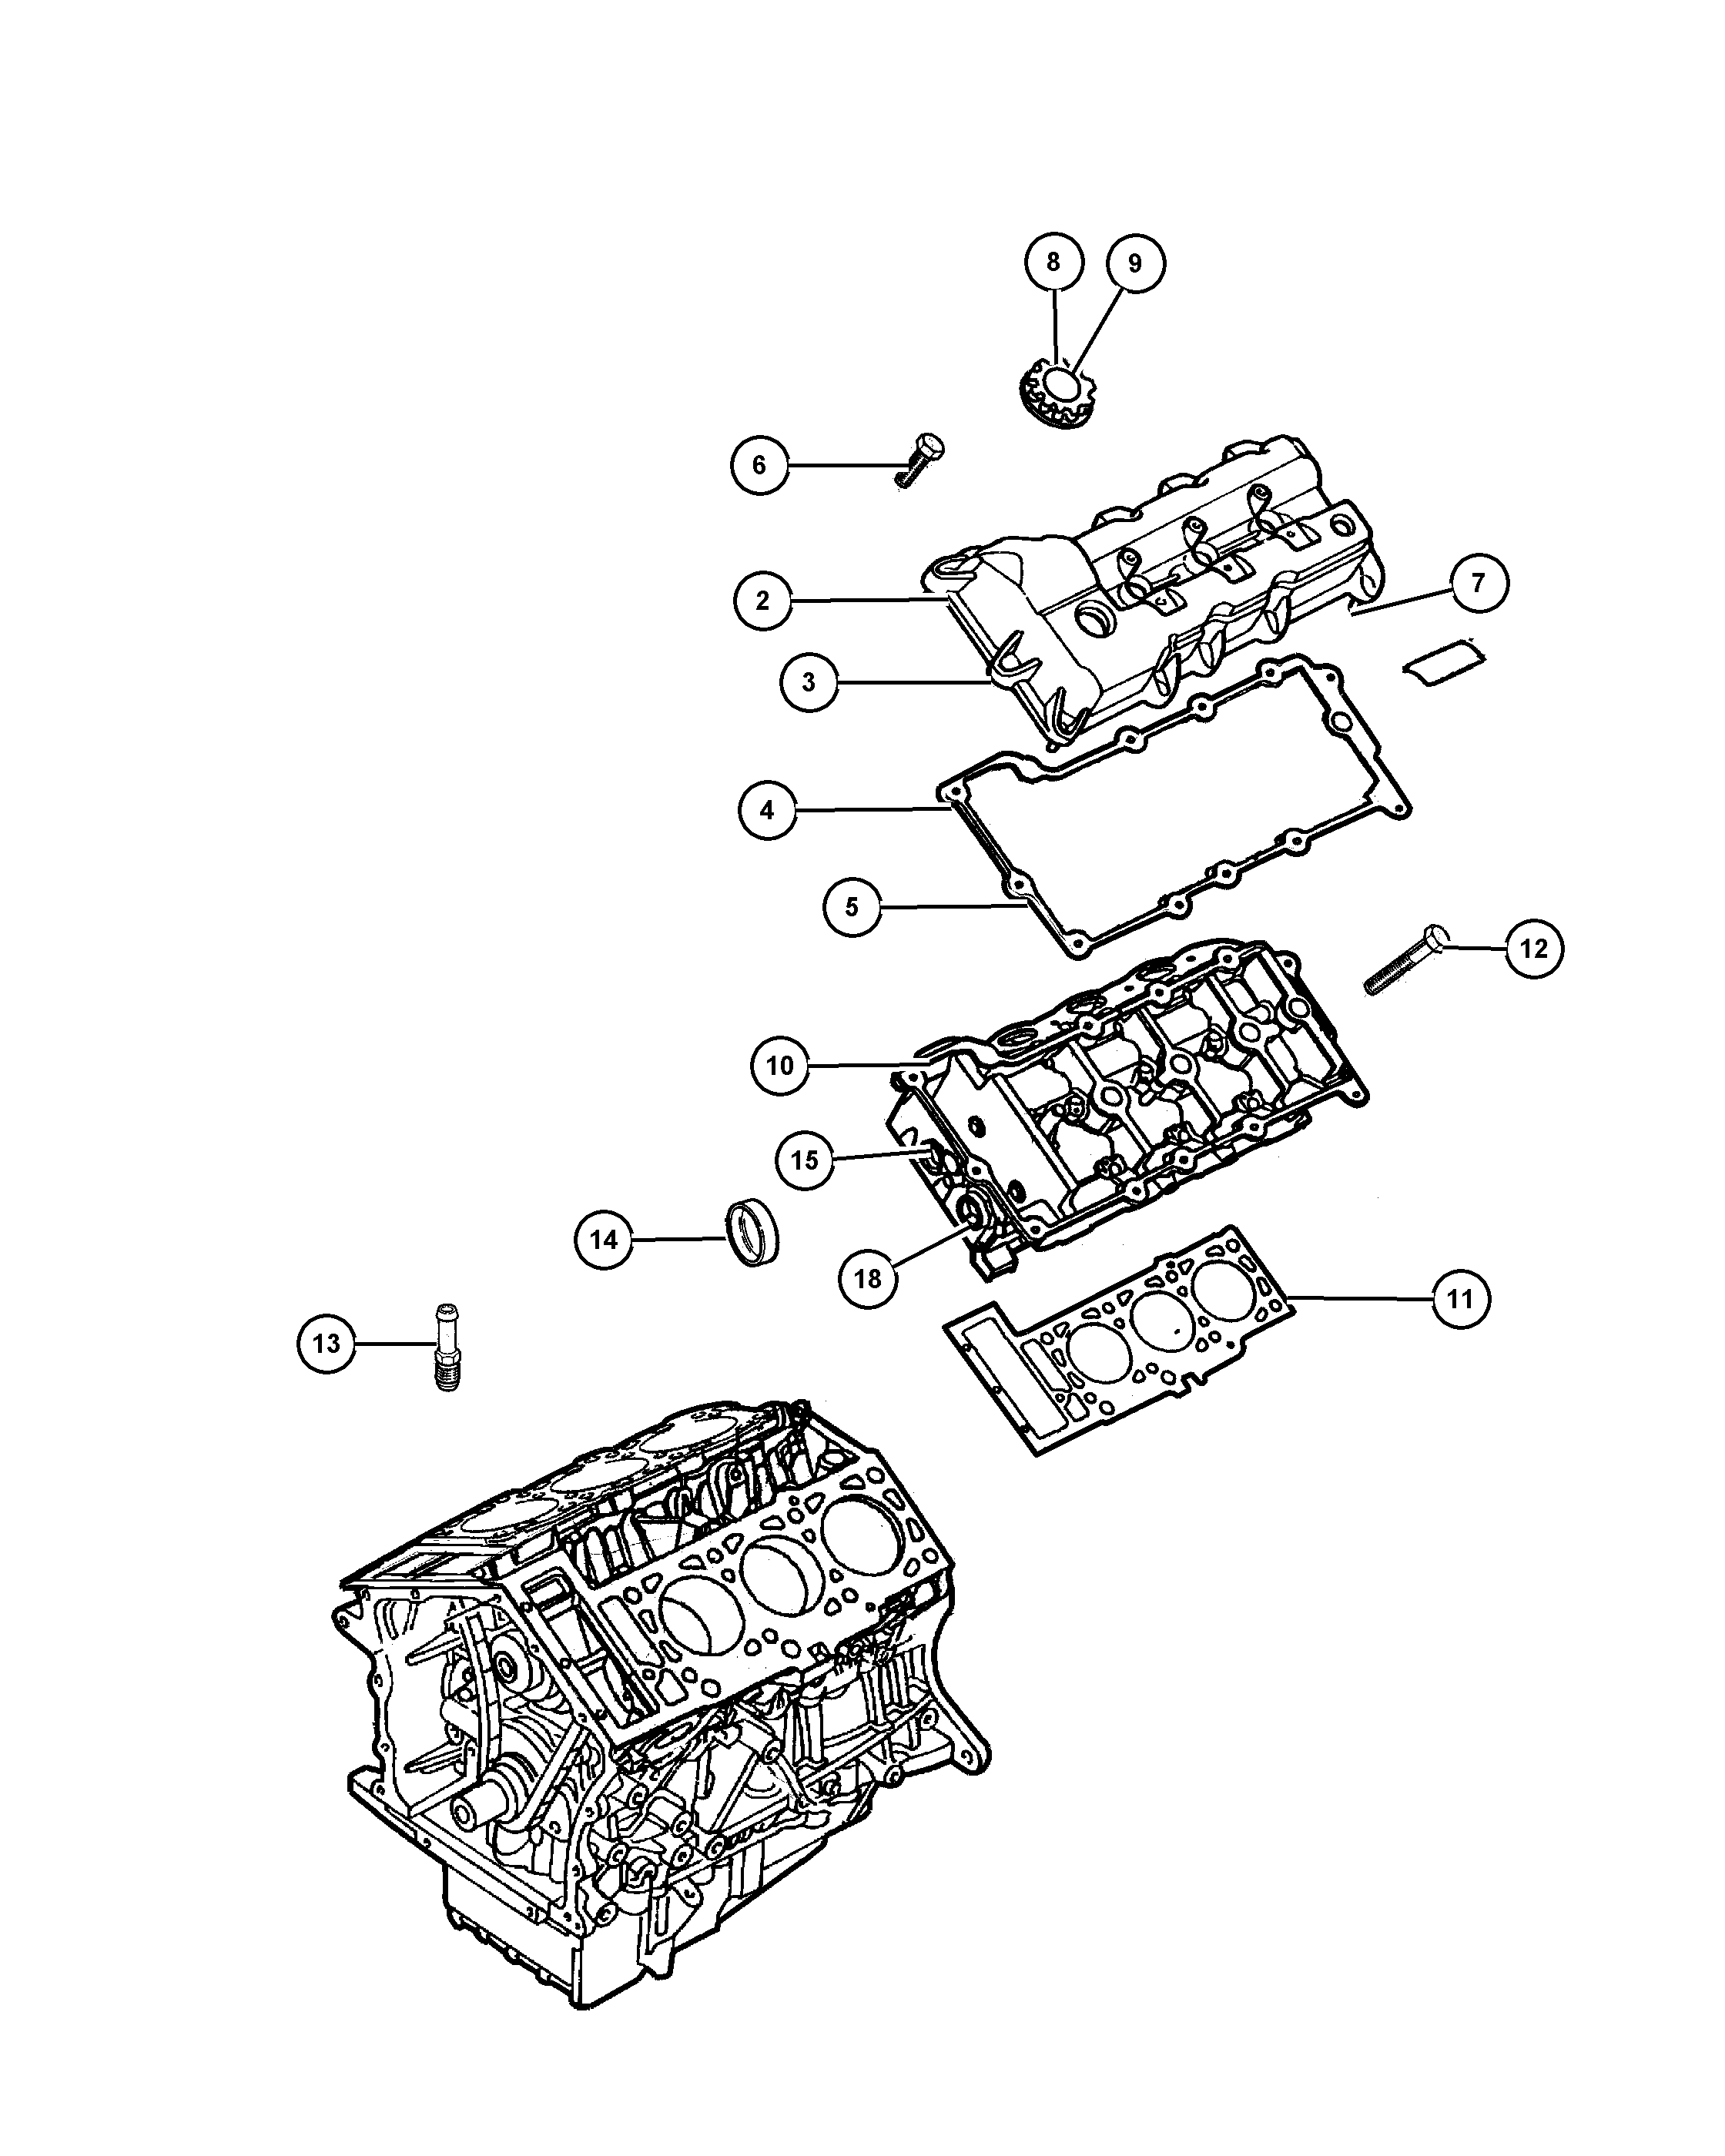 wiring diagram tm5389534914p0030 up electricity sitegm 181cid 30l i4 mercruiser 3332138 thru 5157668 19721978 wiring